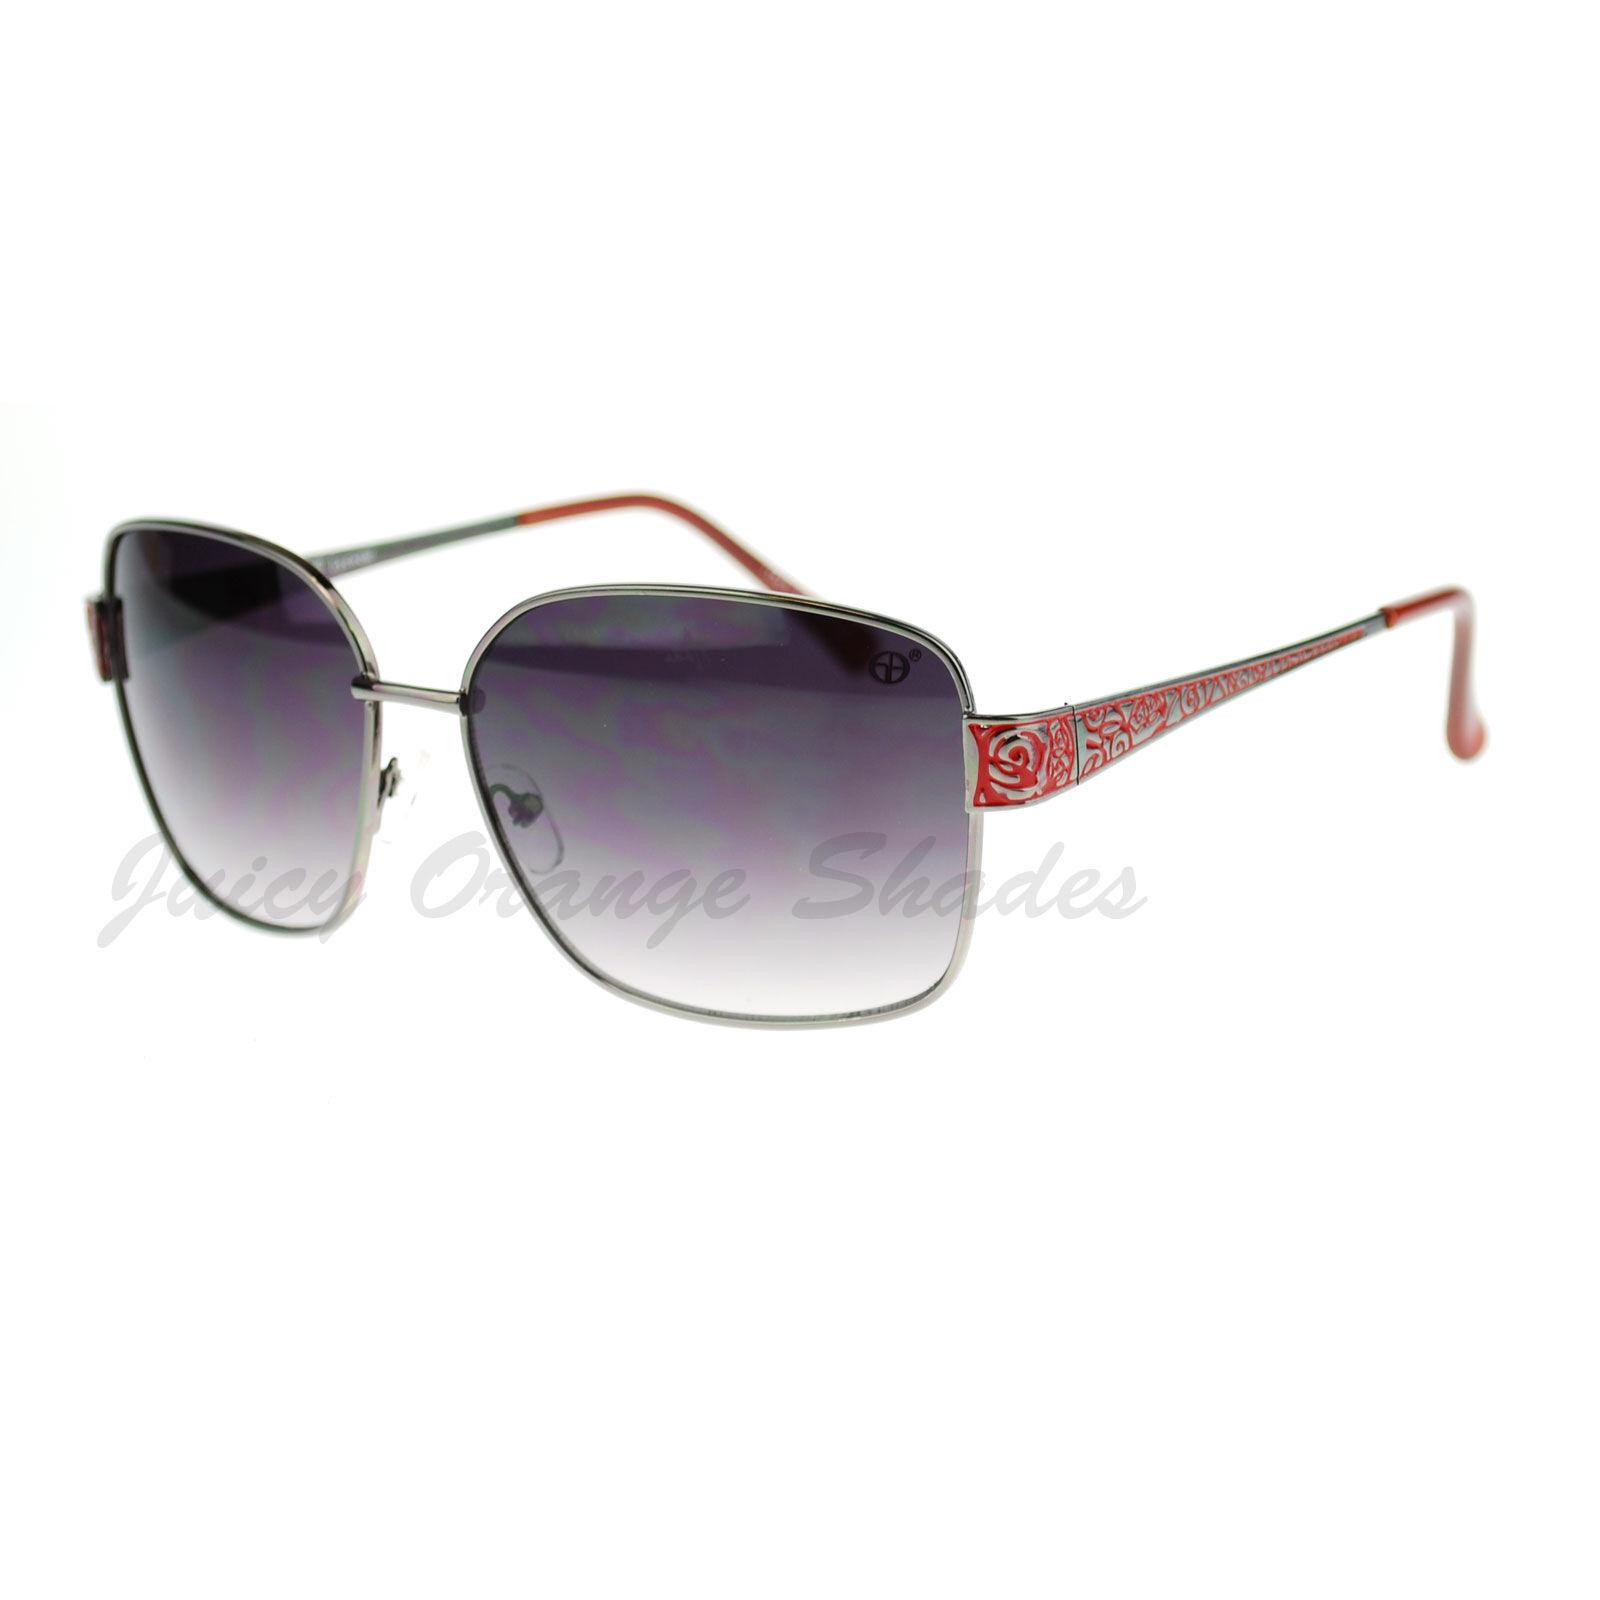 Womens Square Metal Frame Sunglasses Chic Stylish Fashion